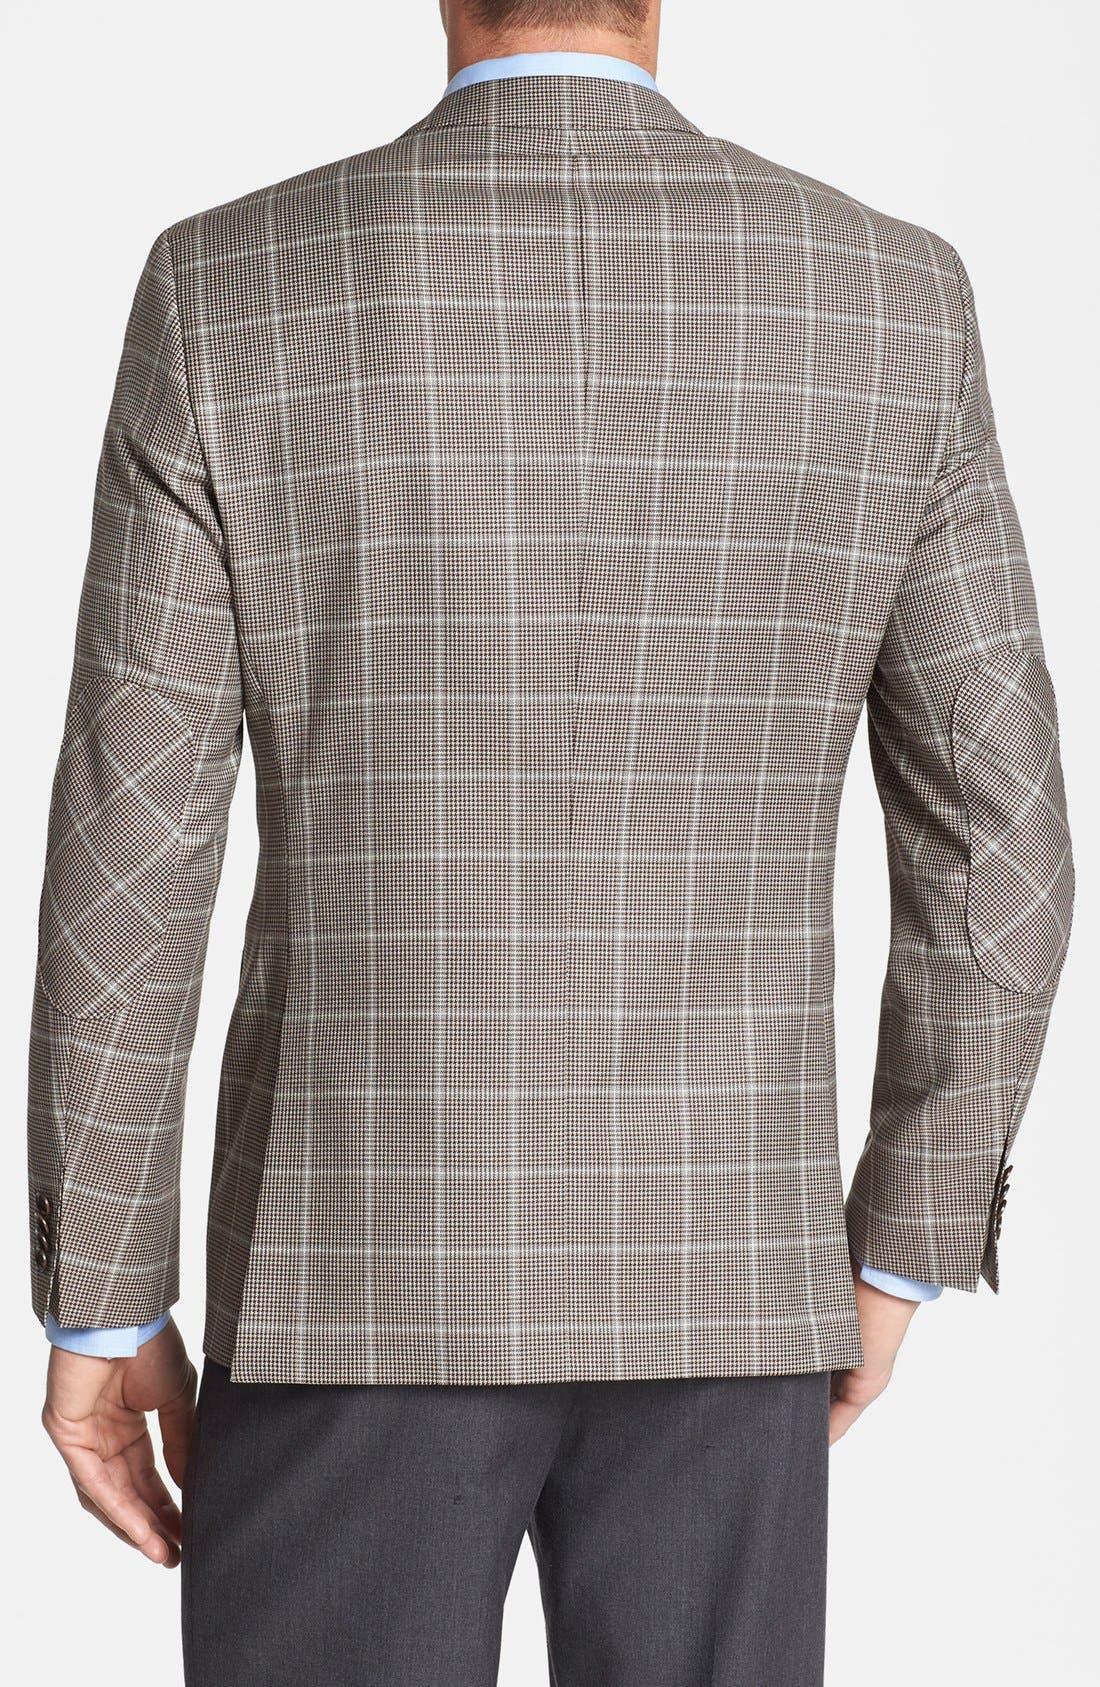 Alternate Image 2  - BOSS HUGO BOSS 'The Smith' Trim Fit Plaid Sportcoat